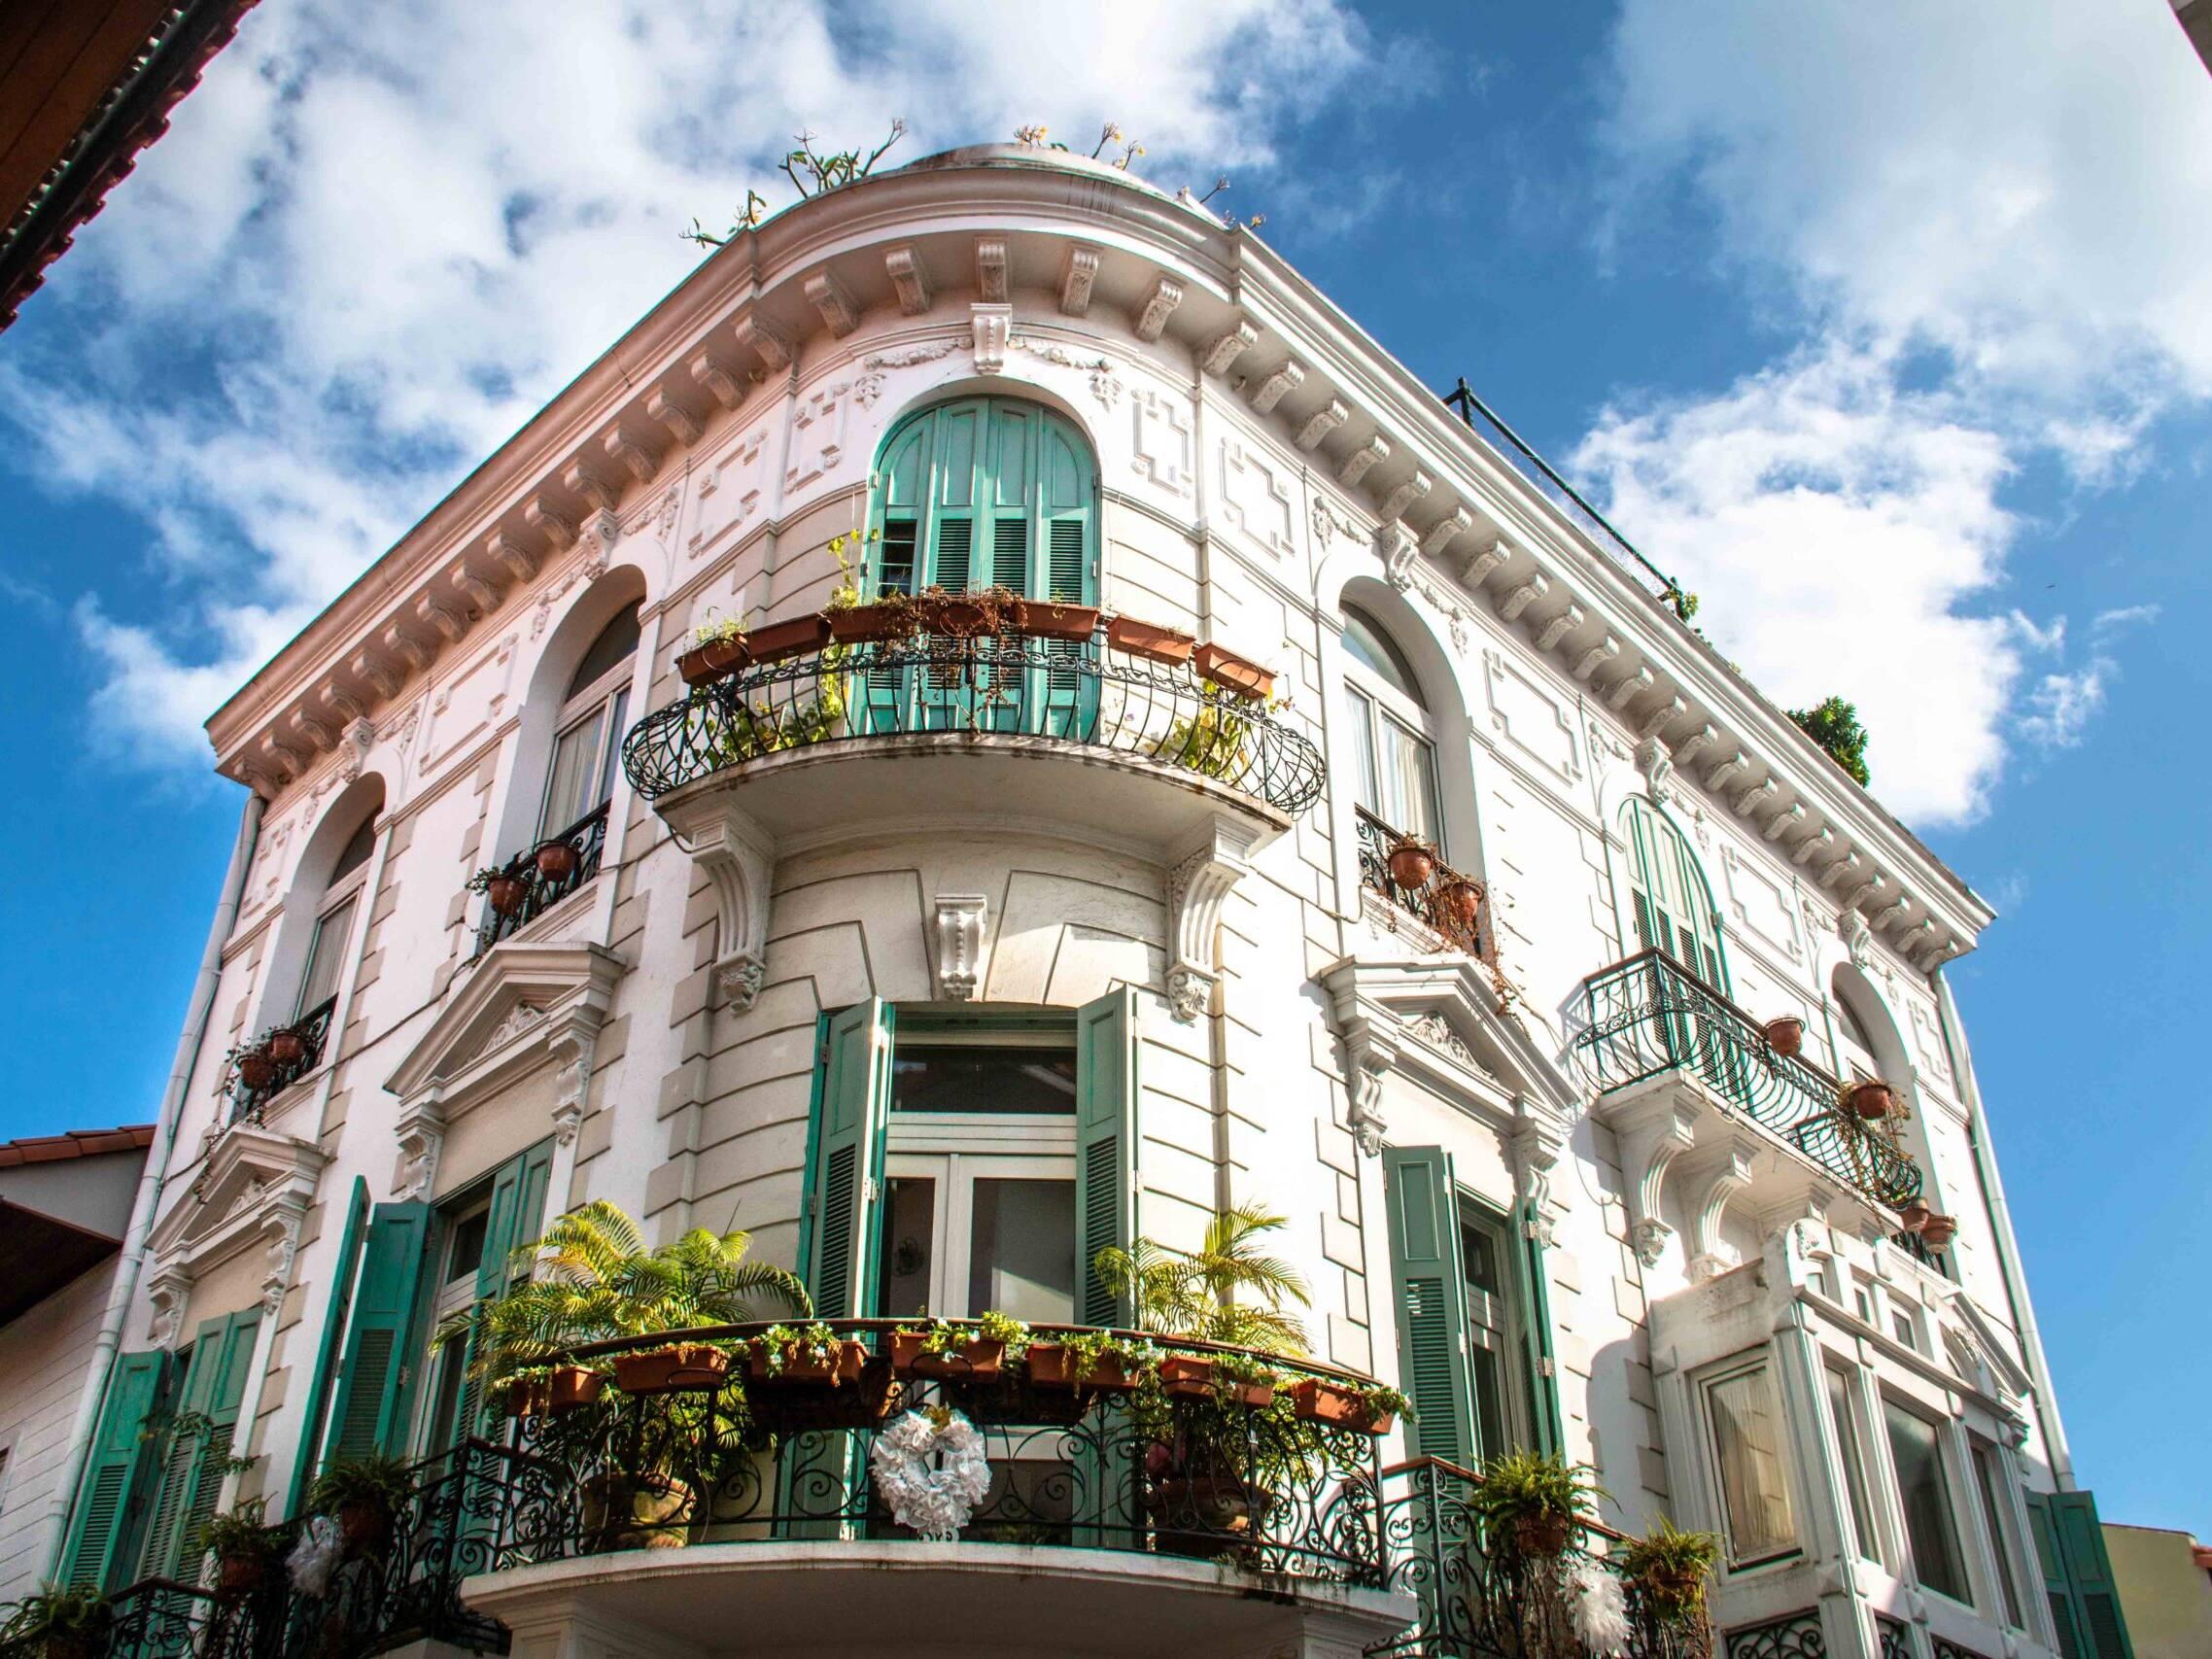 Hotel Las Clementinas in Panama City